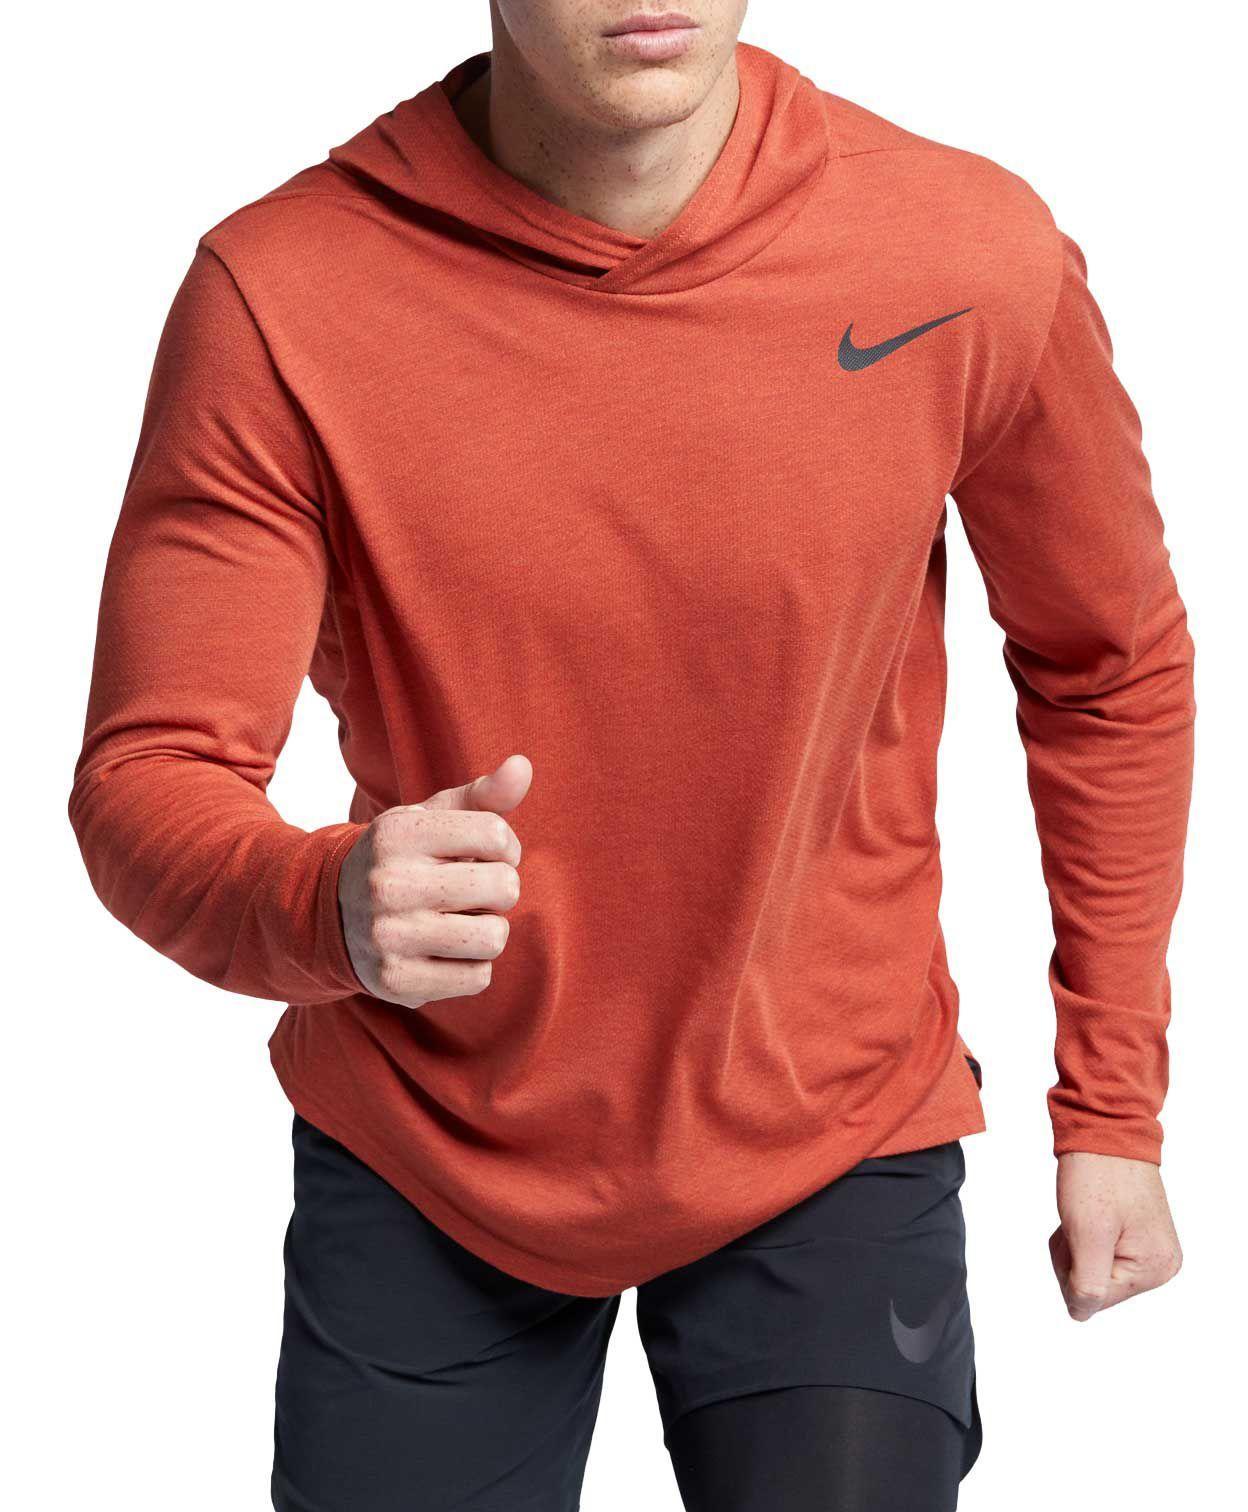 211723ba Nike Hyper Dry Hooded Long Sleeve Tee in Red for Men - Lyst